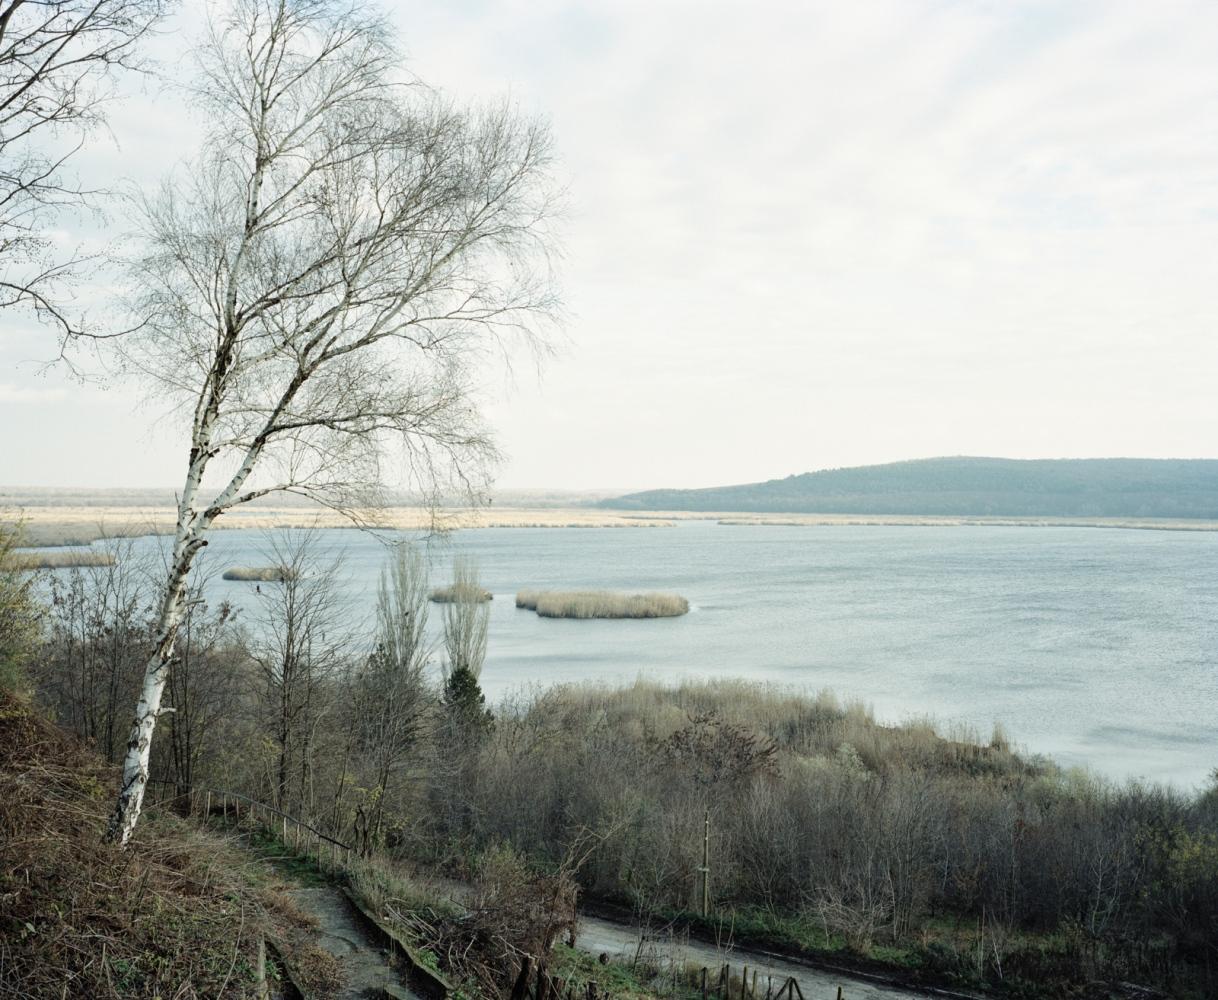 Bulgaria, Belene. a view of the Danube River.